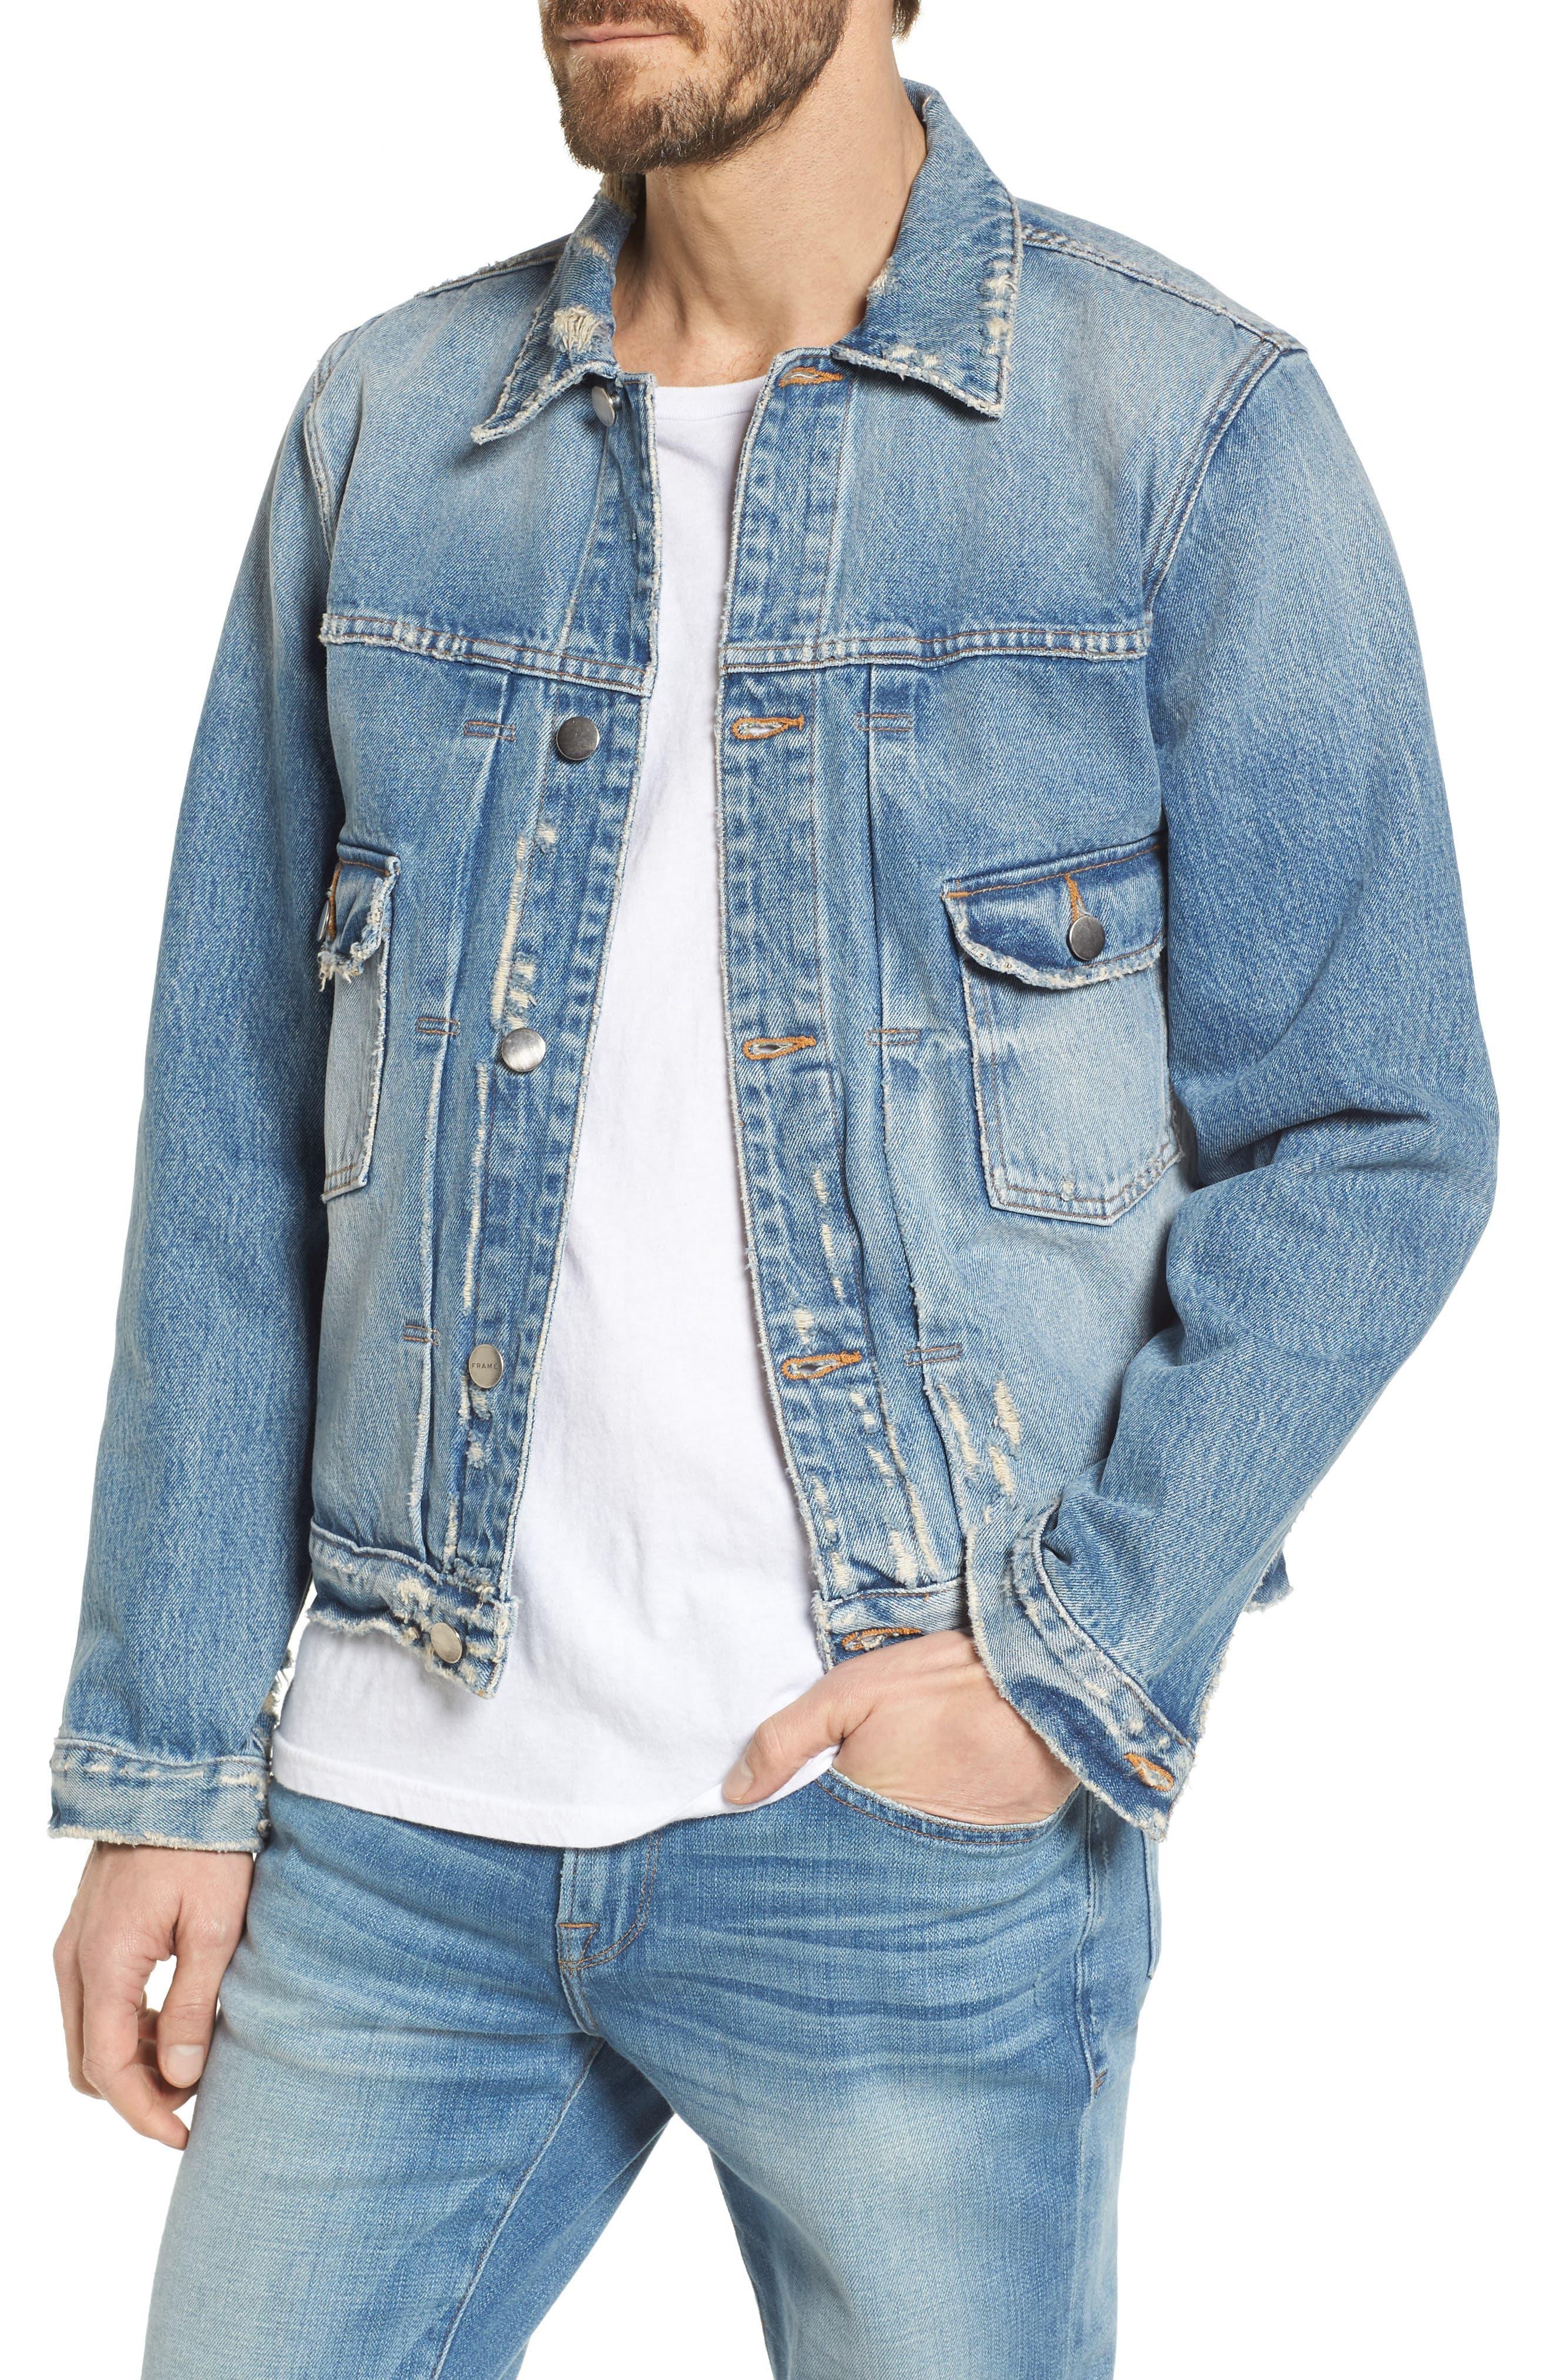 L'Homme Denim Jacket,                             Main thumbnail 1, color,                             PIONEER